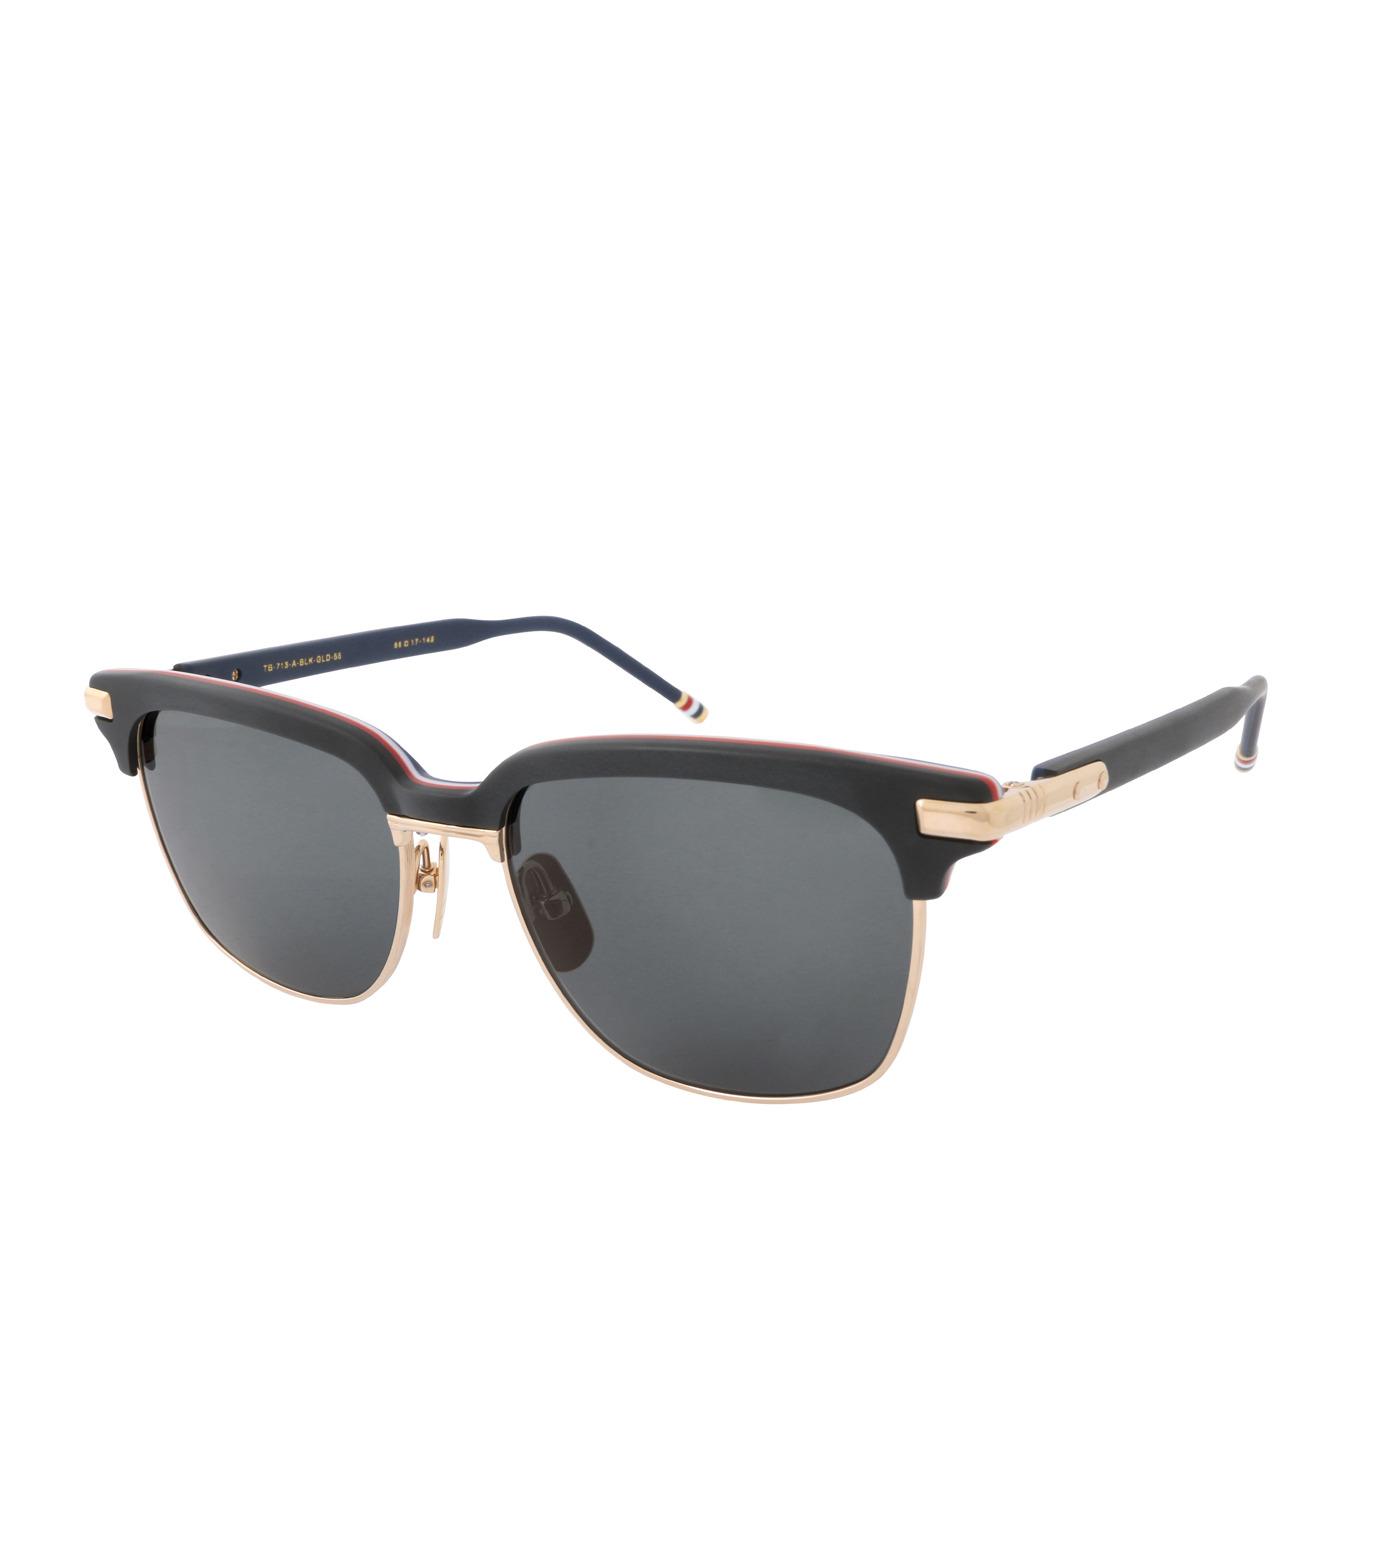 Thom Browne Eye Wear(トム・ブラウン・アイウェア)のBlack Frame-BLACK(アイウェア/eyewear)-TB-713-A-13 拡大詳細画像1